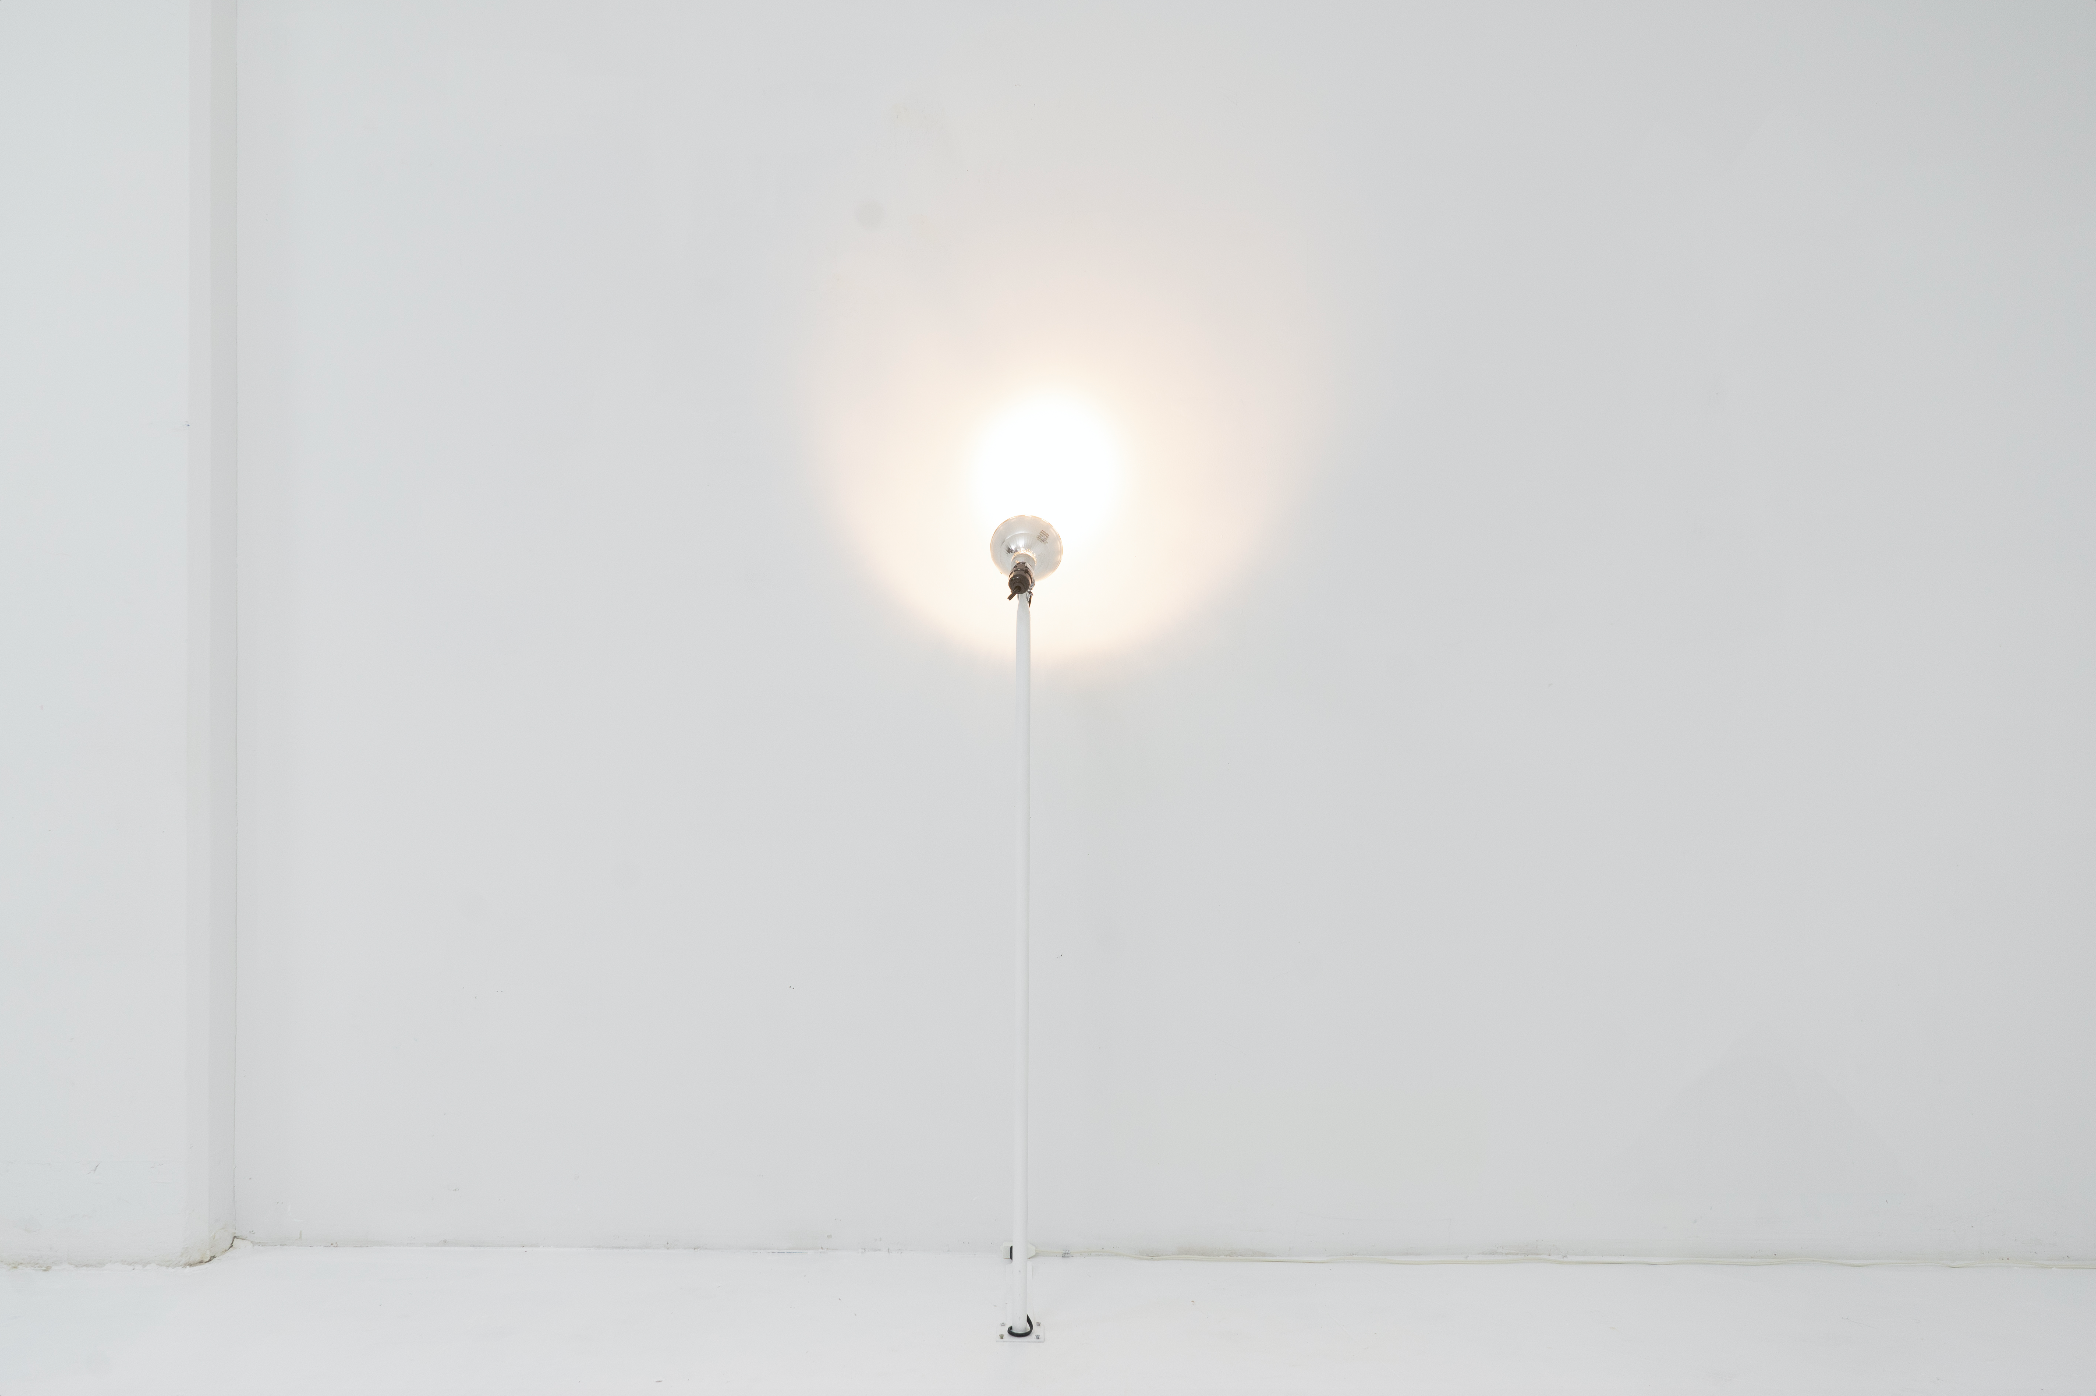 70W bulb  bulb, customized stand, light